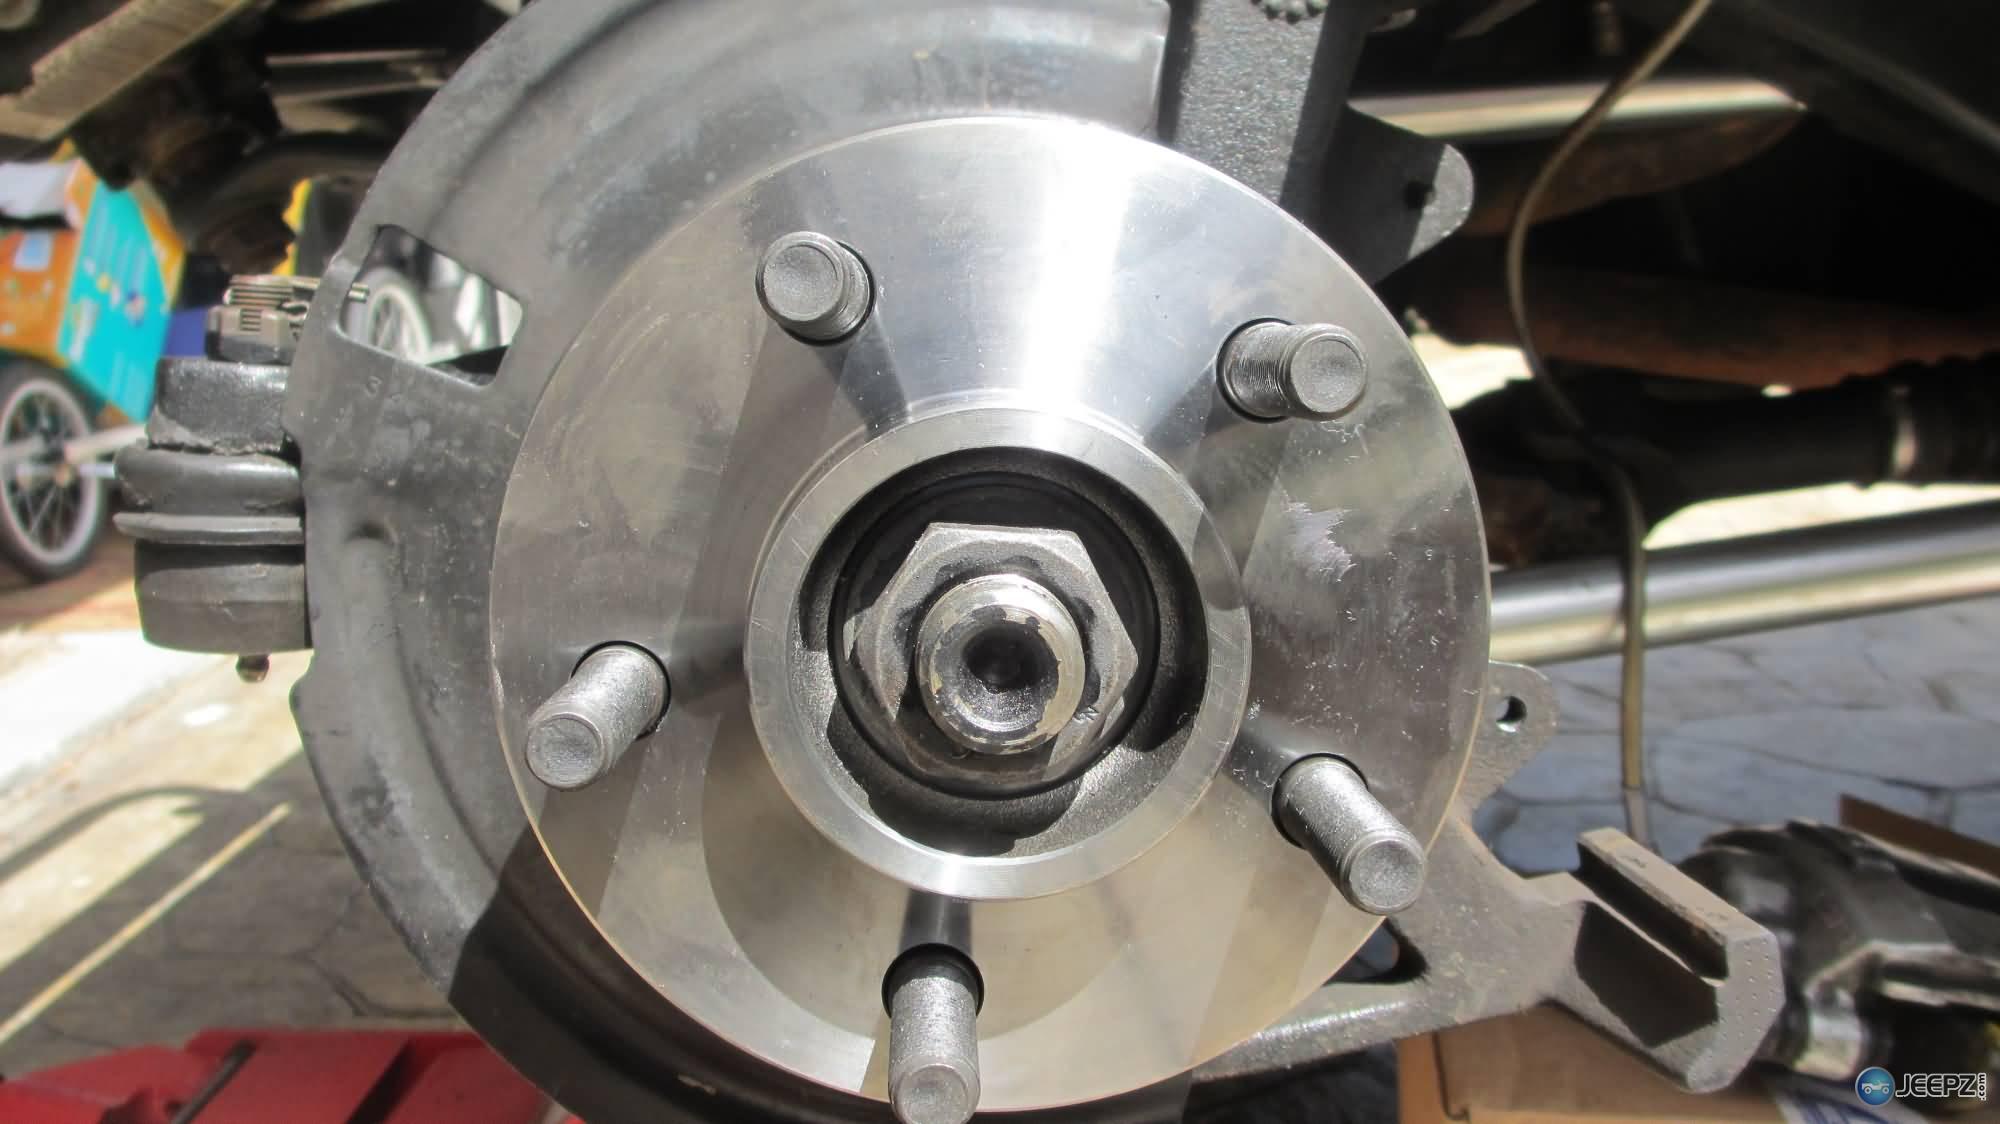 Wrangler TJ wheel hub / bearing assembly replacement